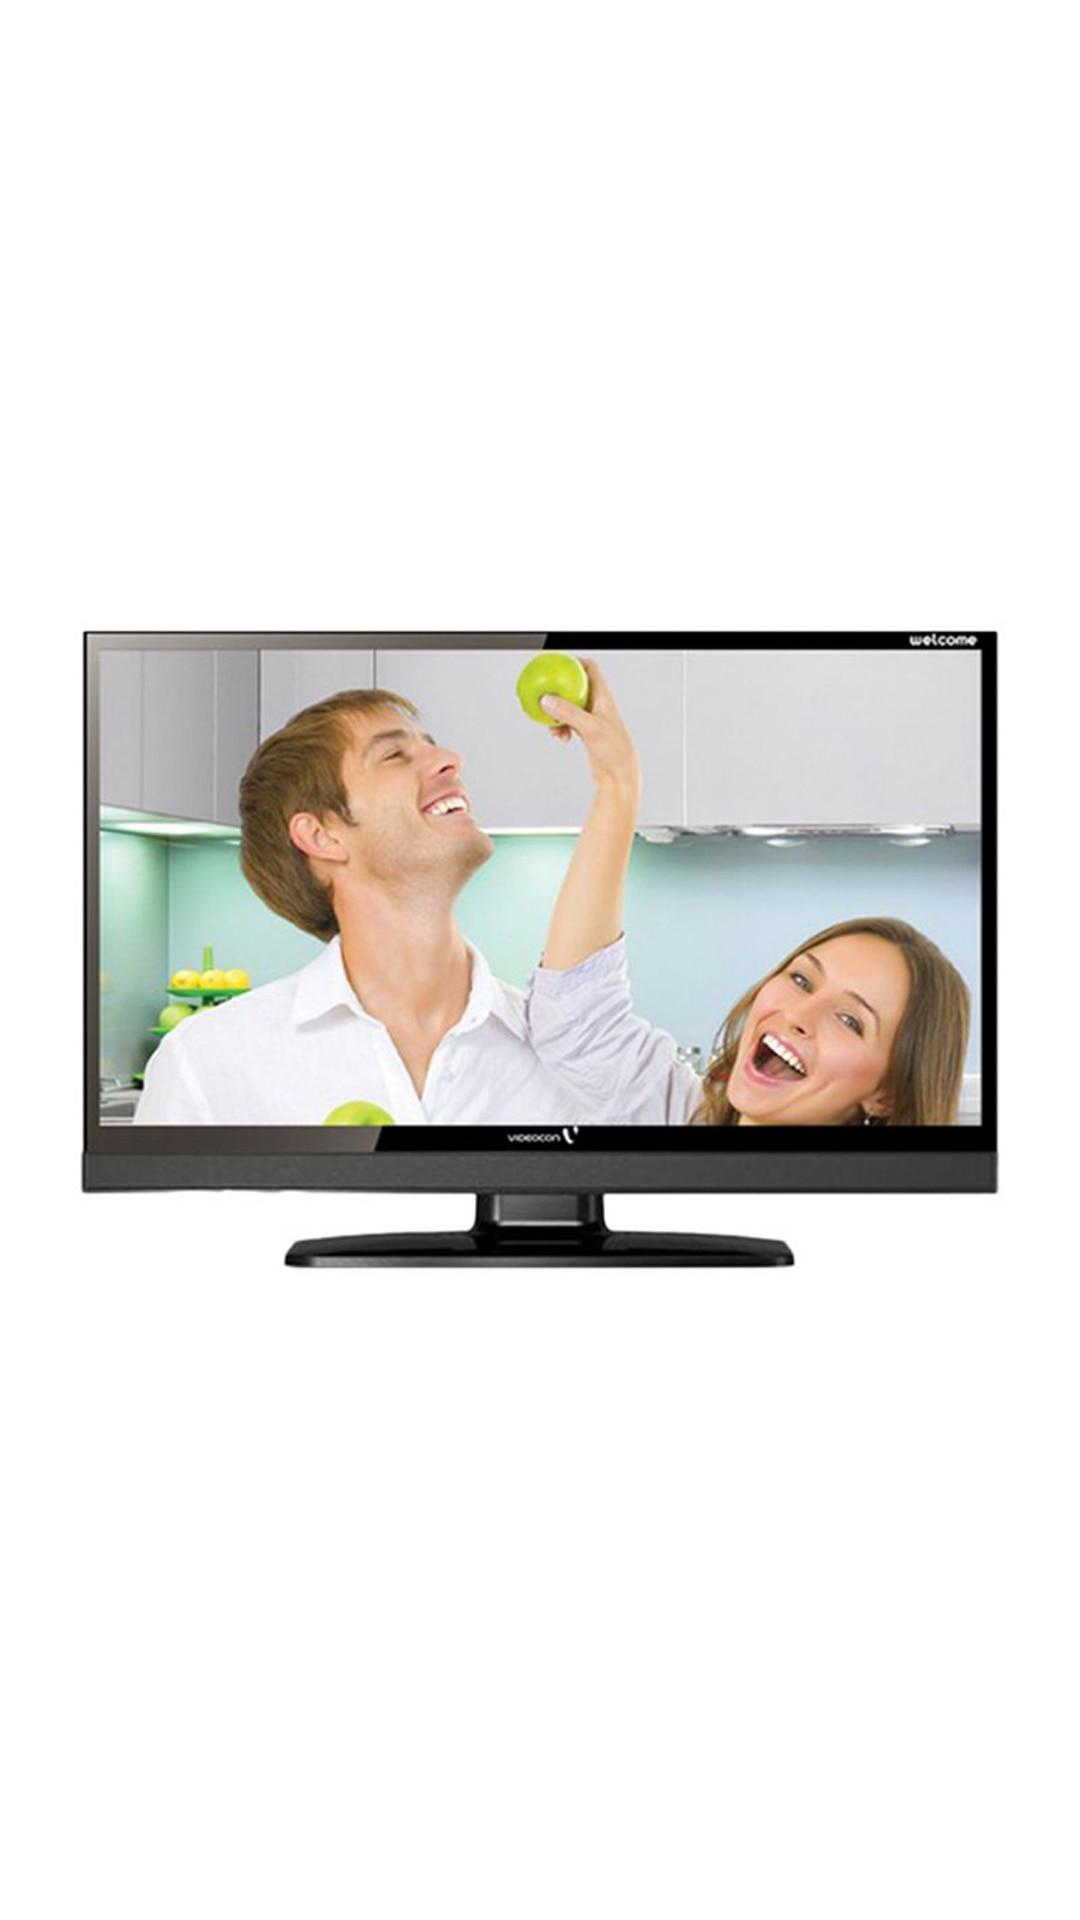 VIDEOCON IVC24F2 24 Inches Full HD LED TV